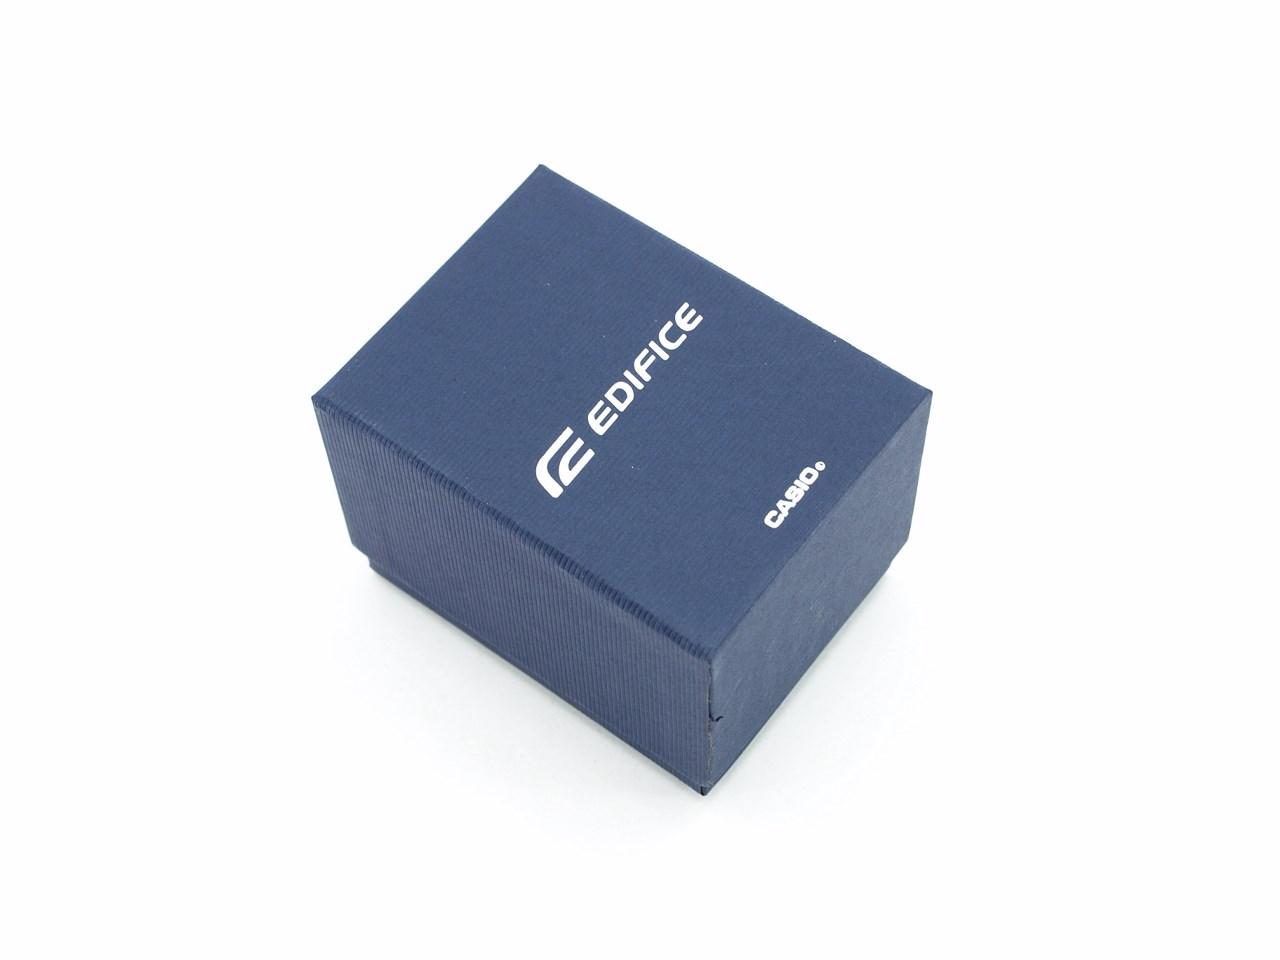 Casio Edifice Ef 558d 1avef